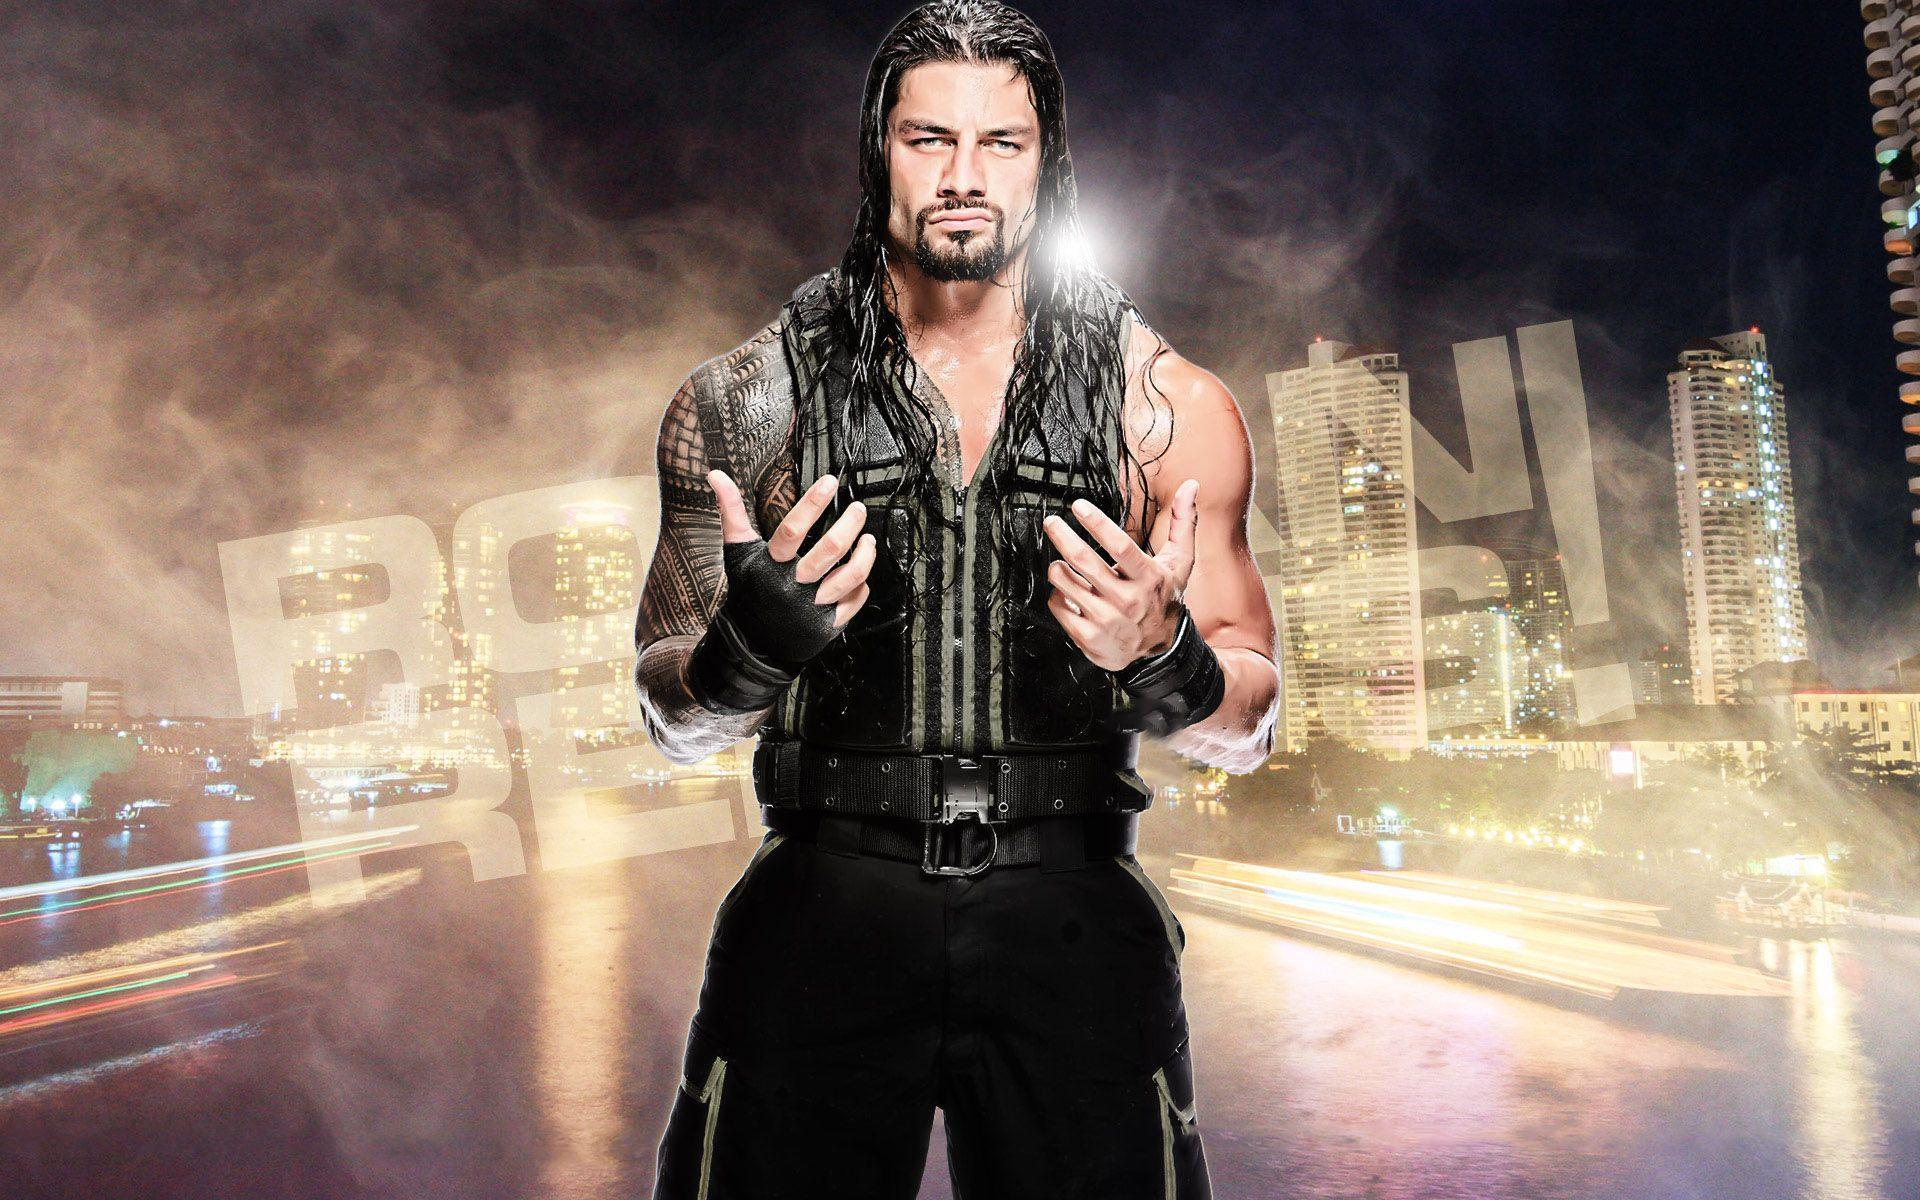 Hd Roman Reigns Wallpaper: WWE Roman Reigns HD Wallpapers